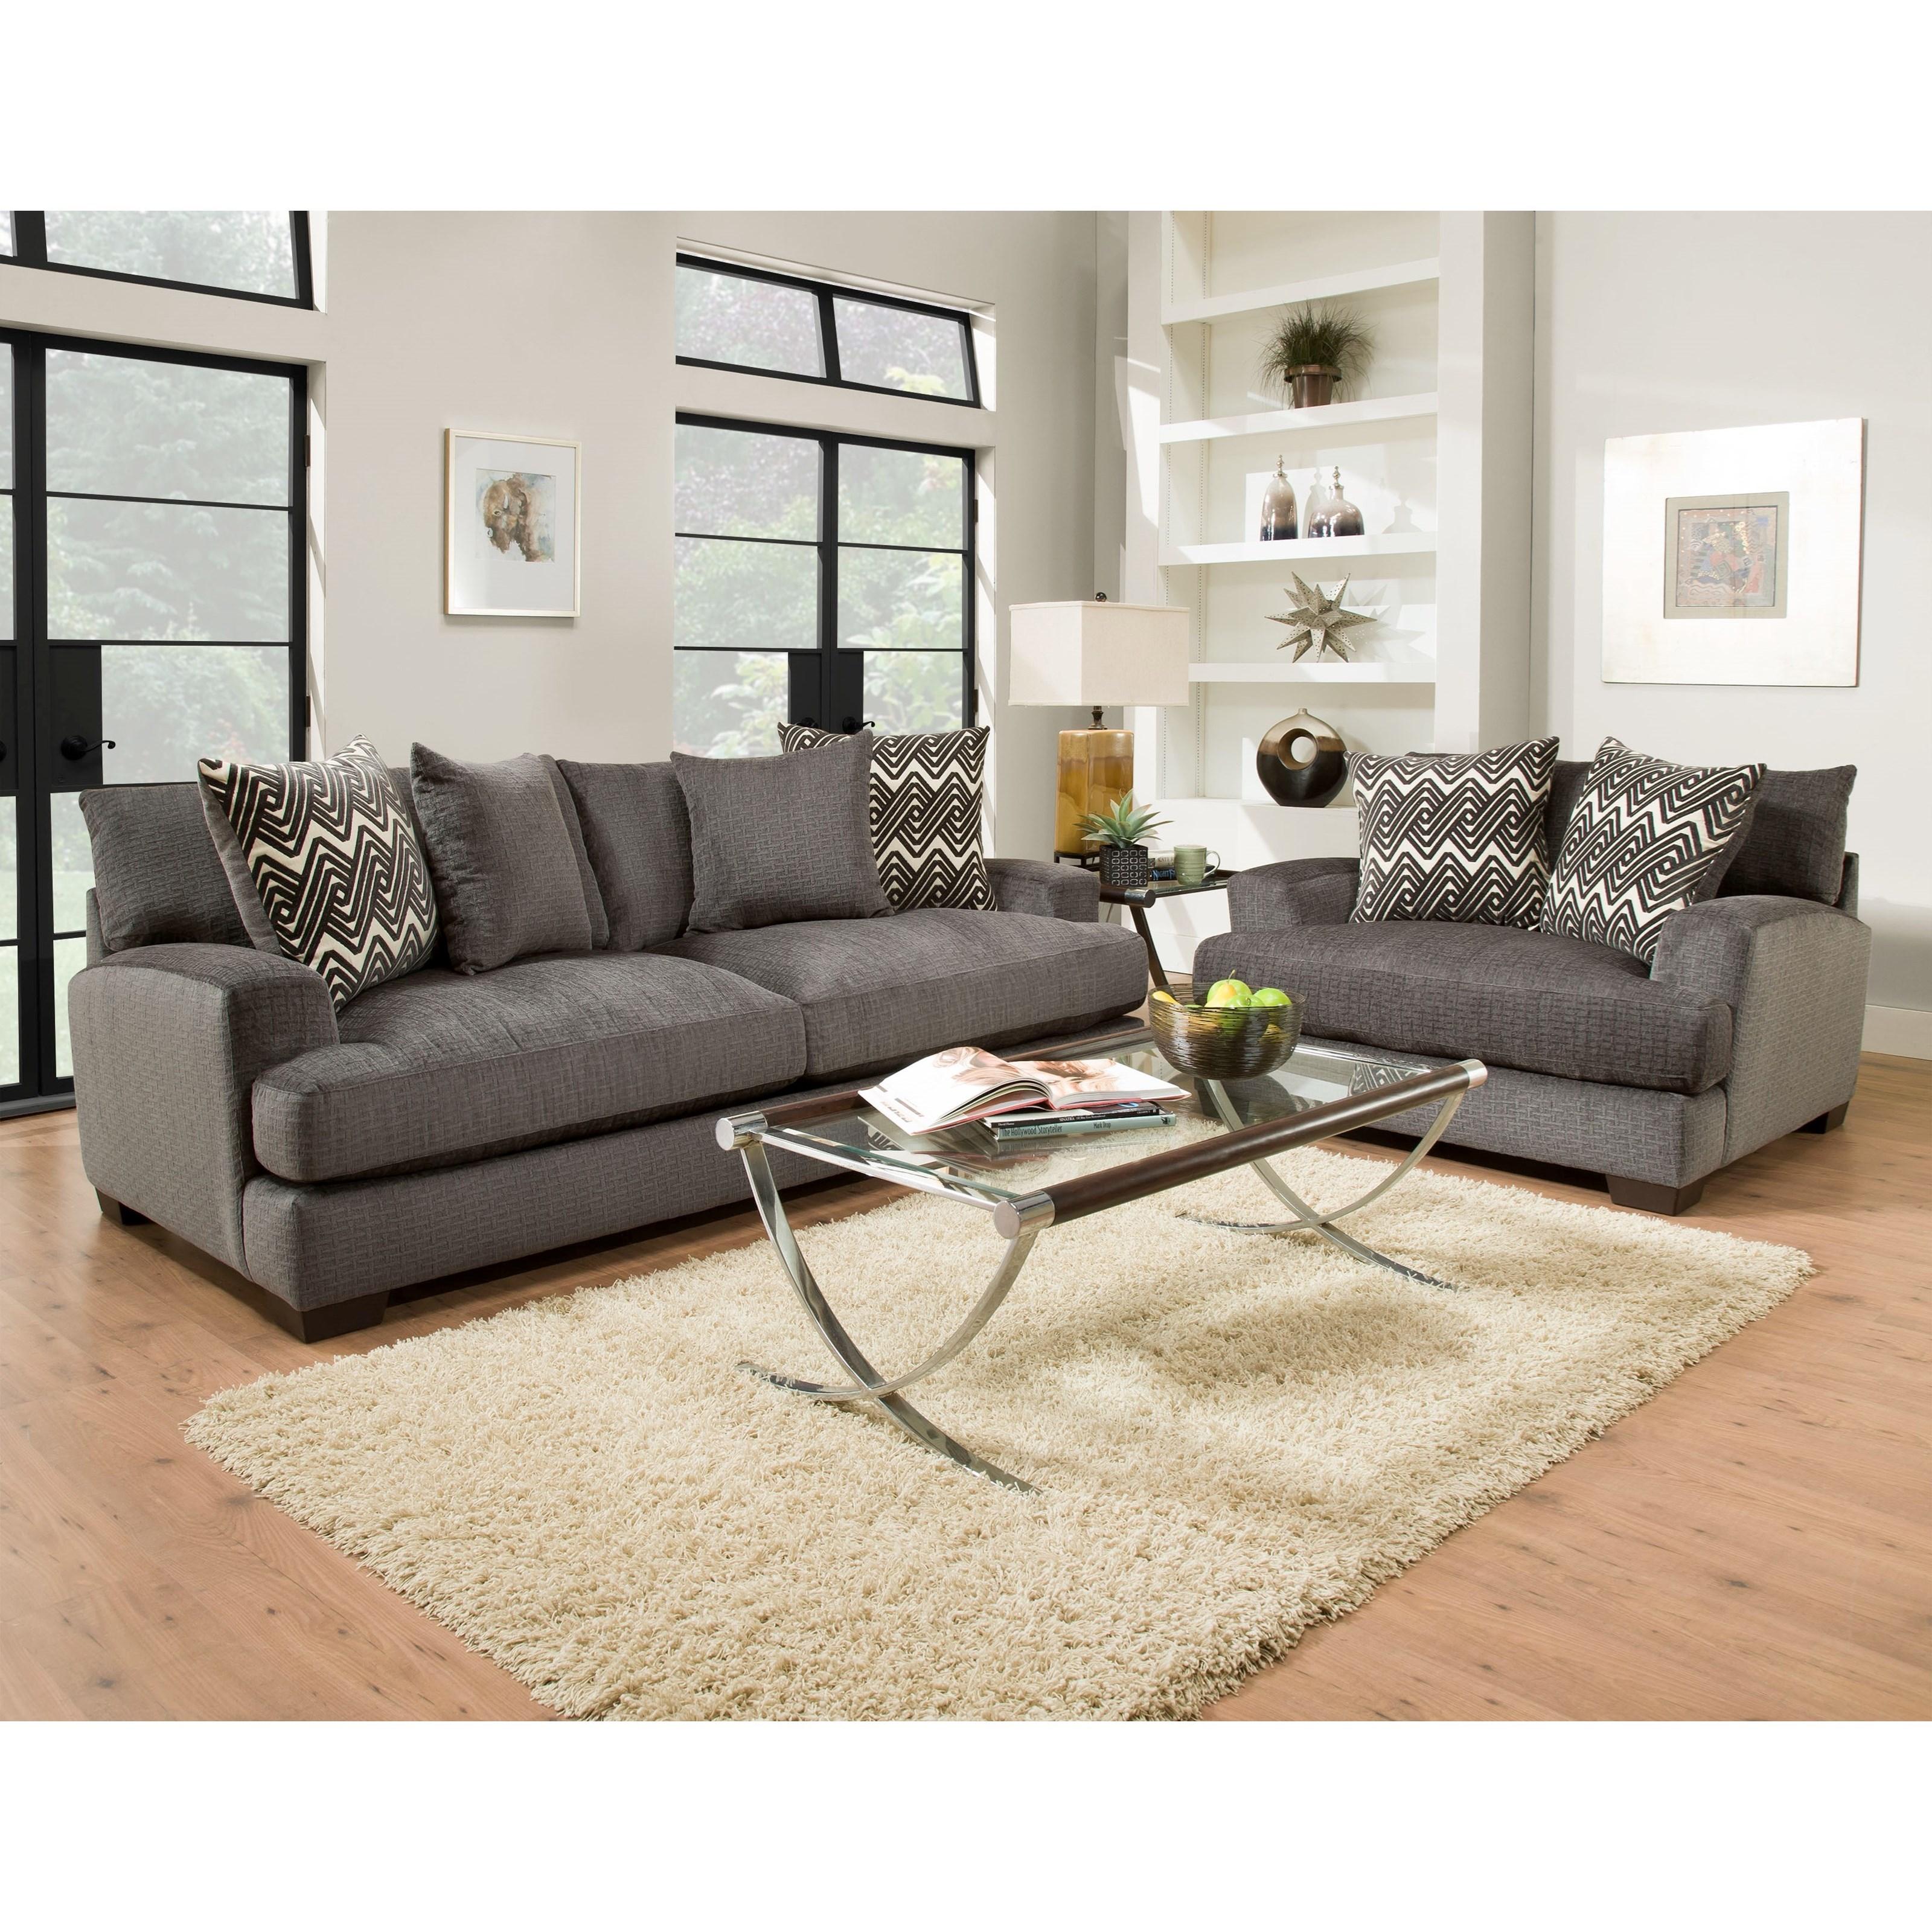 American Furniture 1600 Living Room Group - Item Number: 1600 Living Room Group 1-Smoke